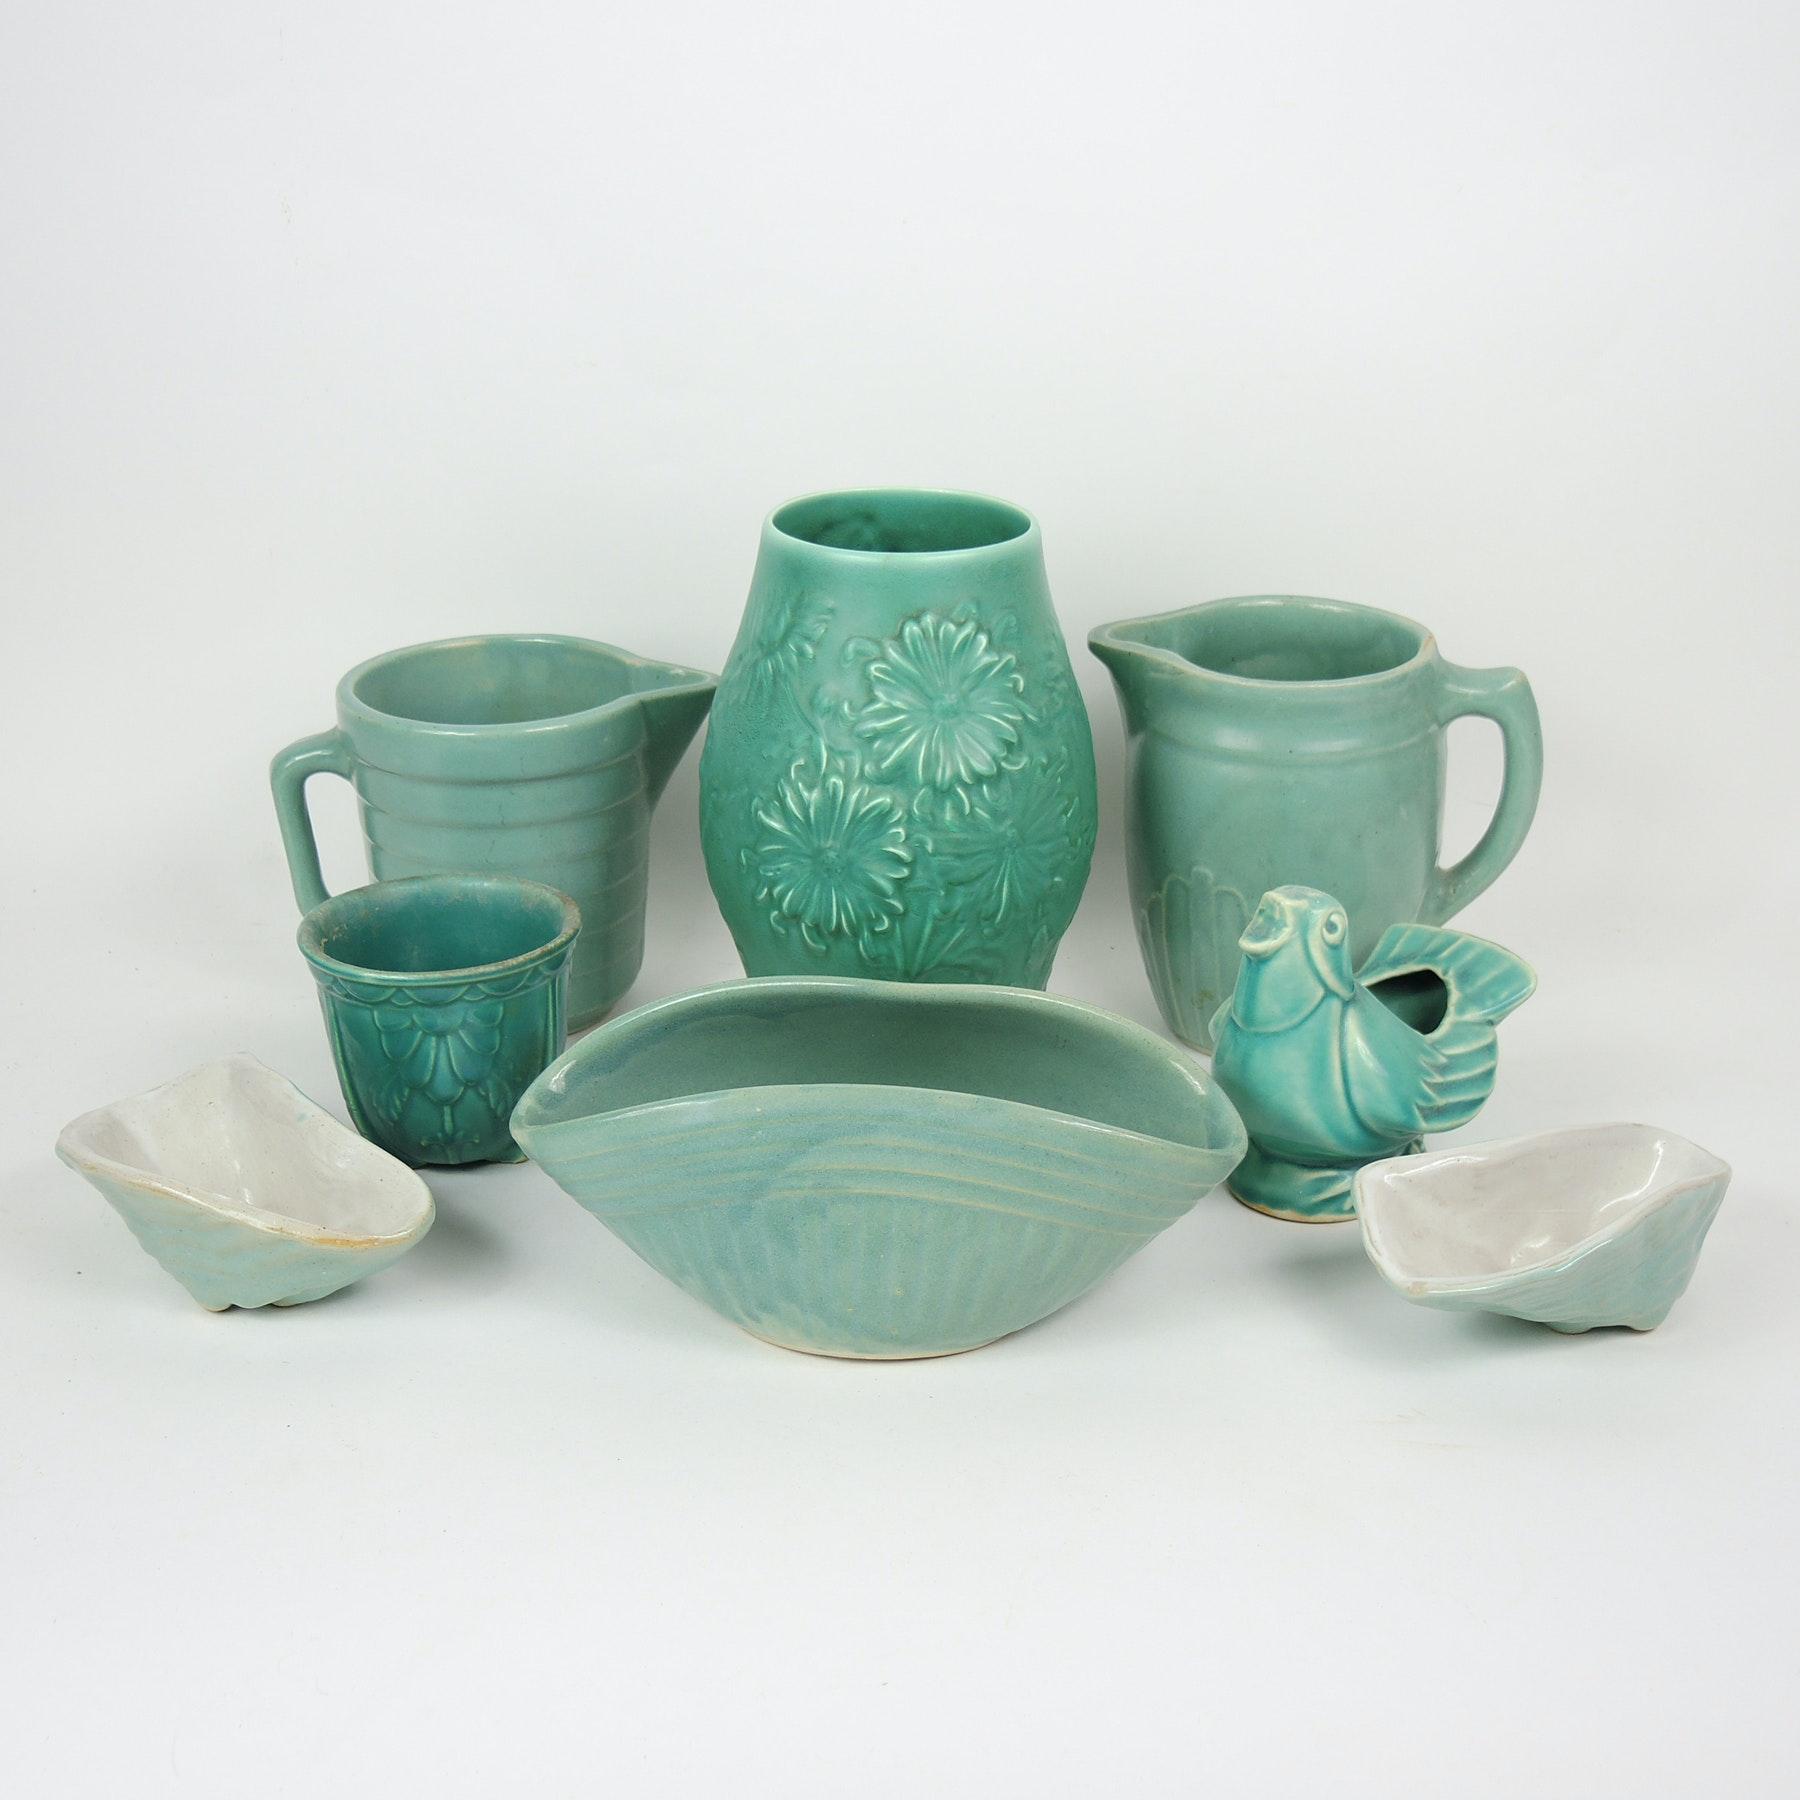 Art Pottery Including Royal Winton